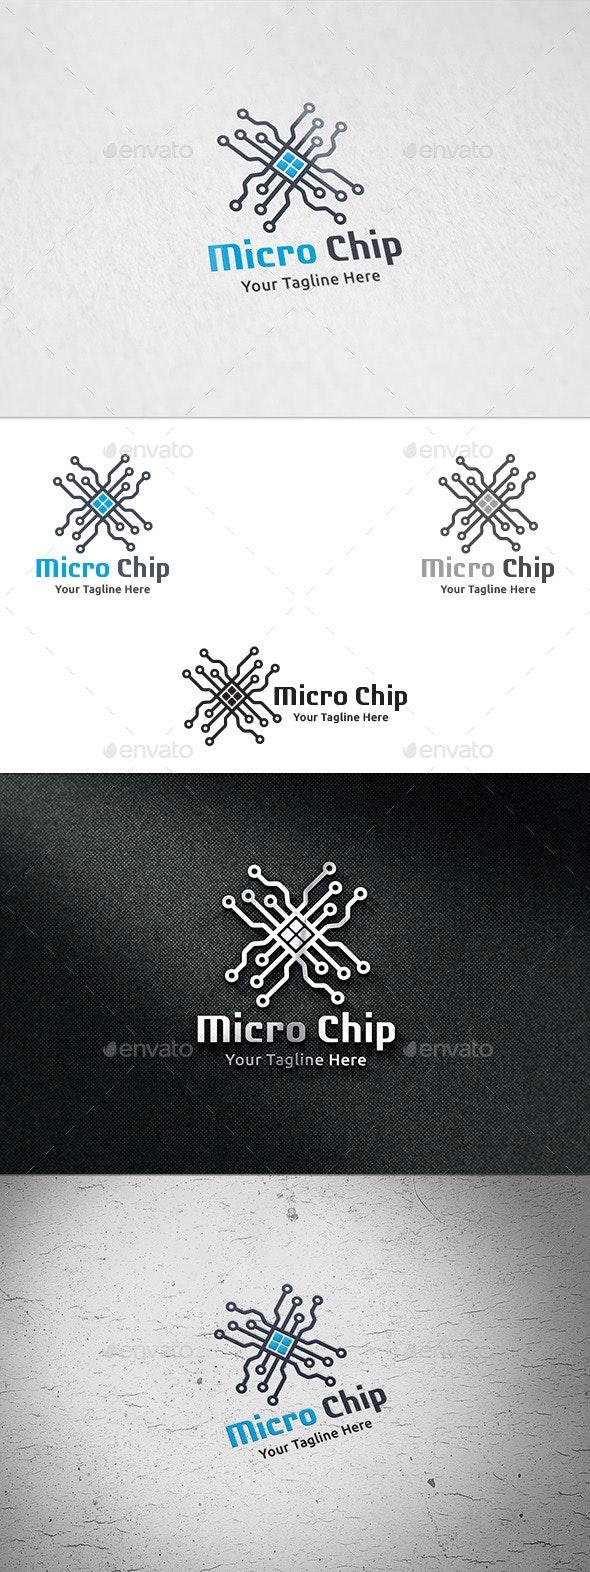 Micro Chip - Logo Template - Vector Abstract